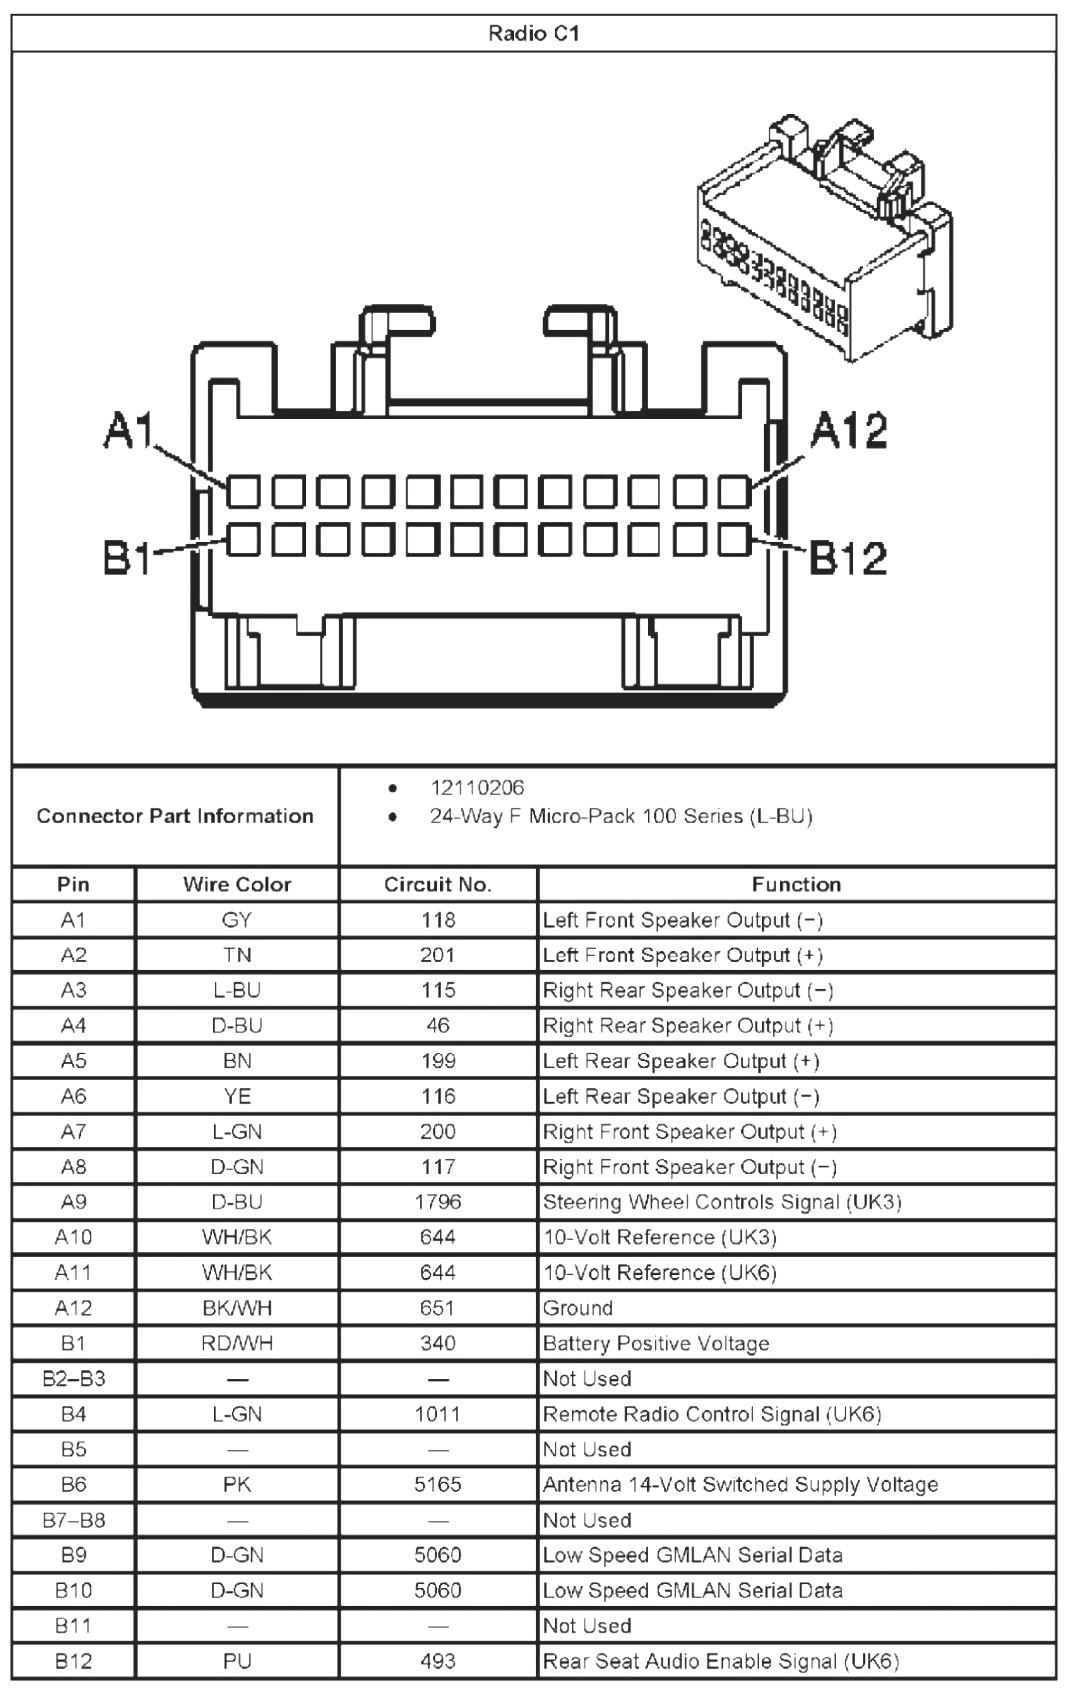 2003 Chevrolet Radio Wiring Diagram